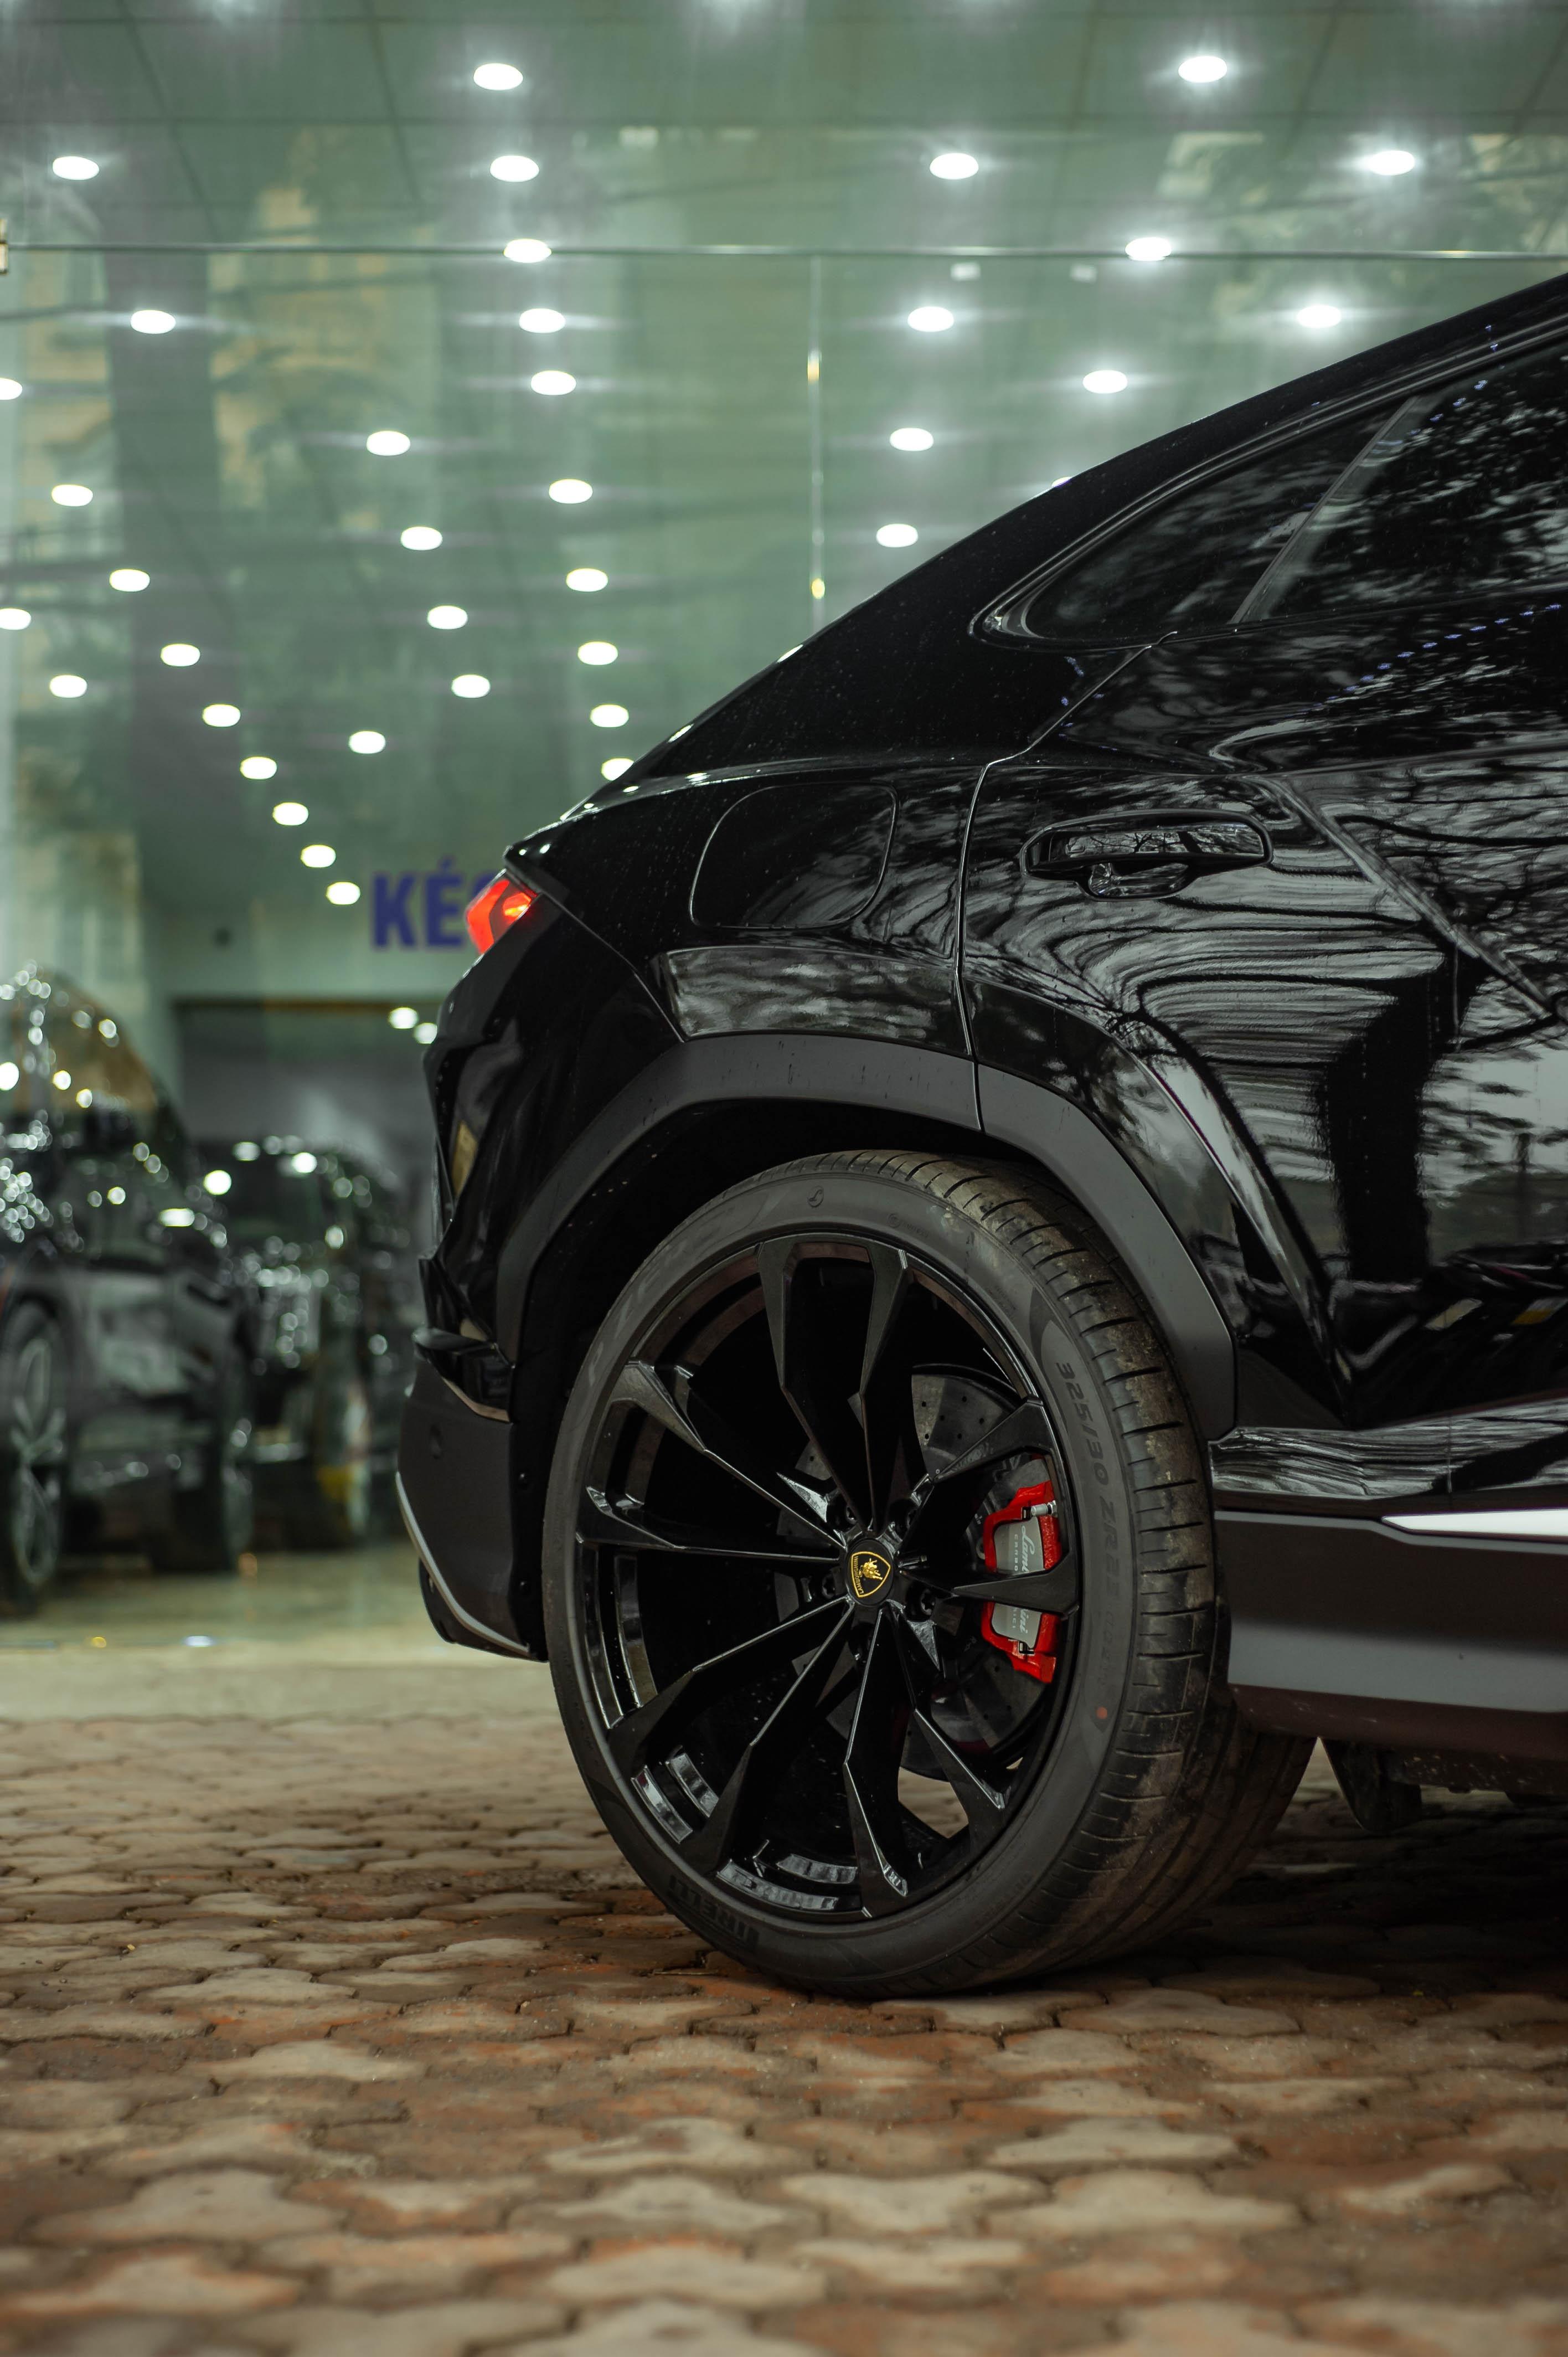 Ngam Lamborghini Urus mau den dau tien ve VN, gia khoang 1 trieu USD hinh anh 8 Urus_zing_54_.jpg